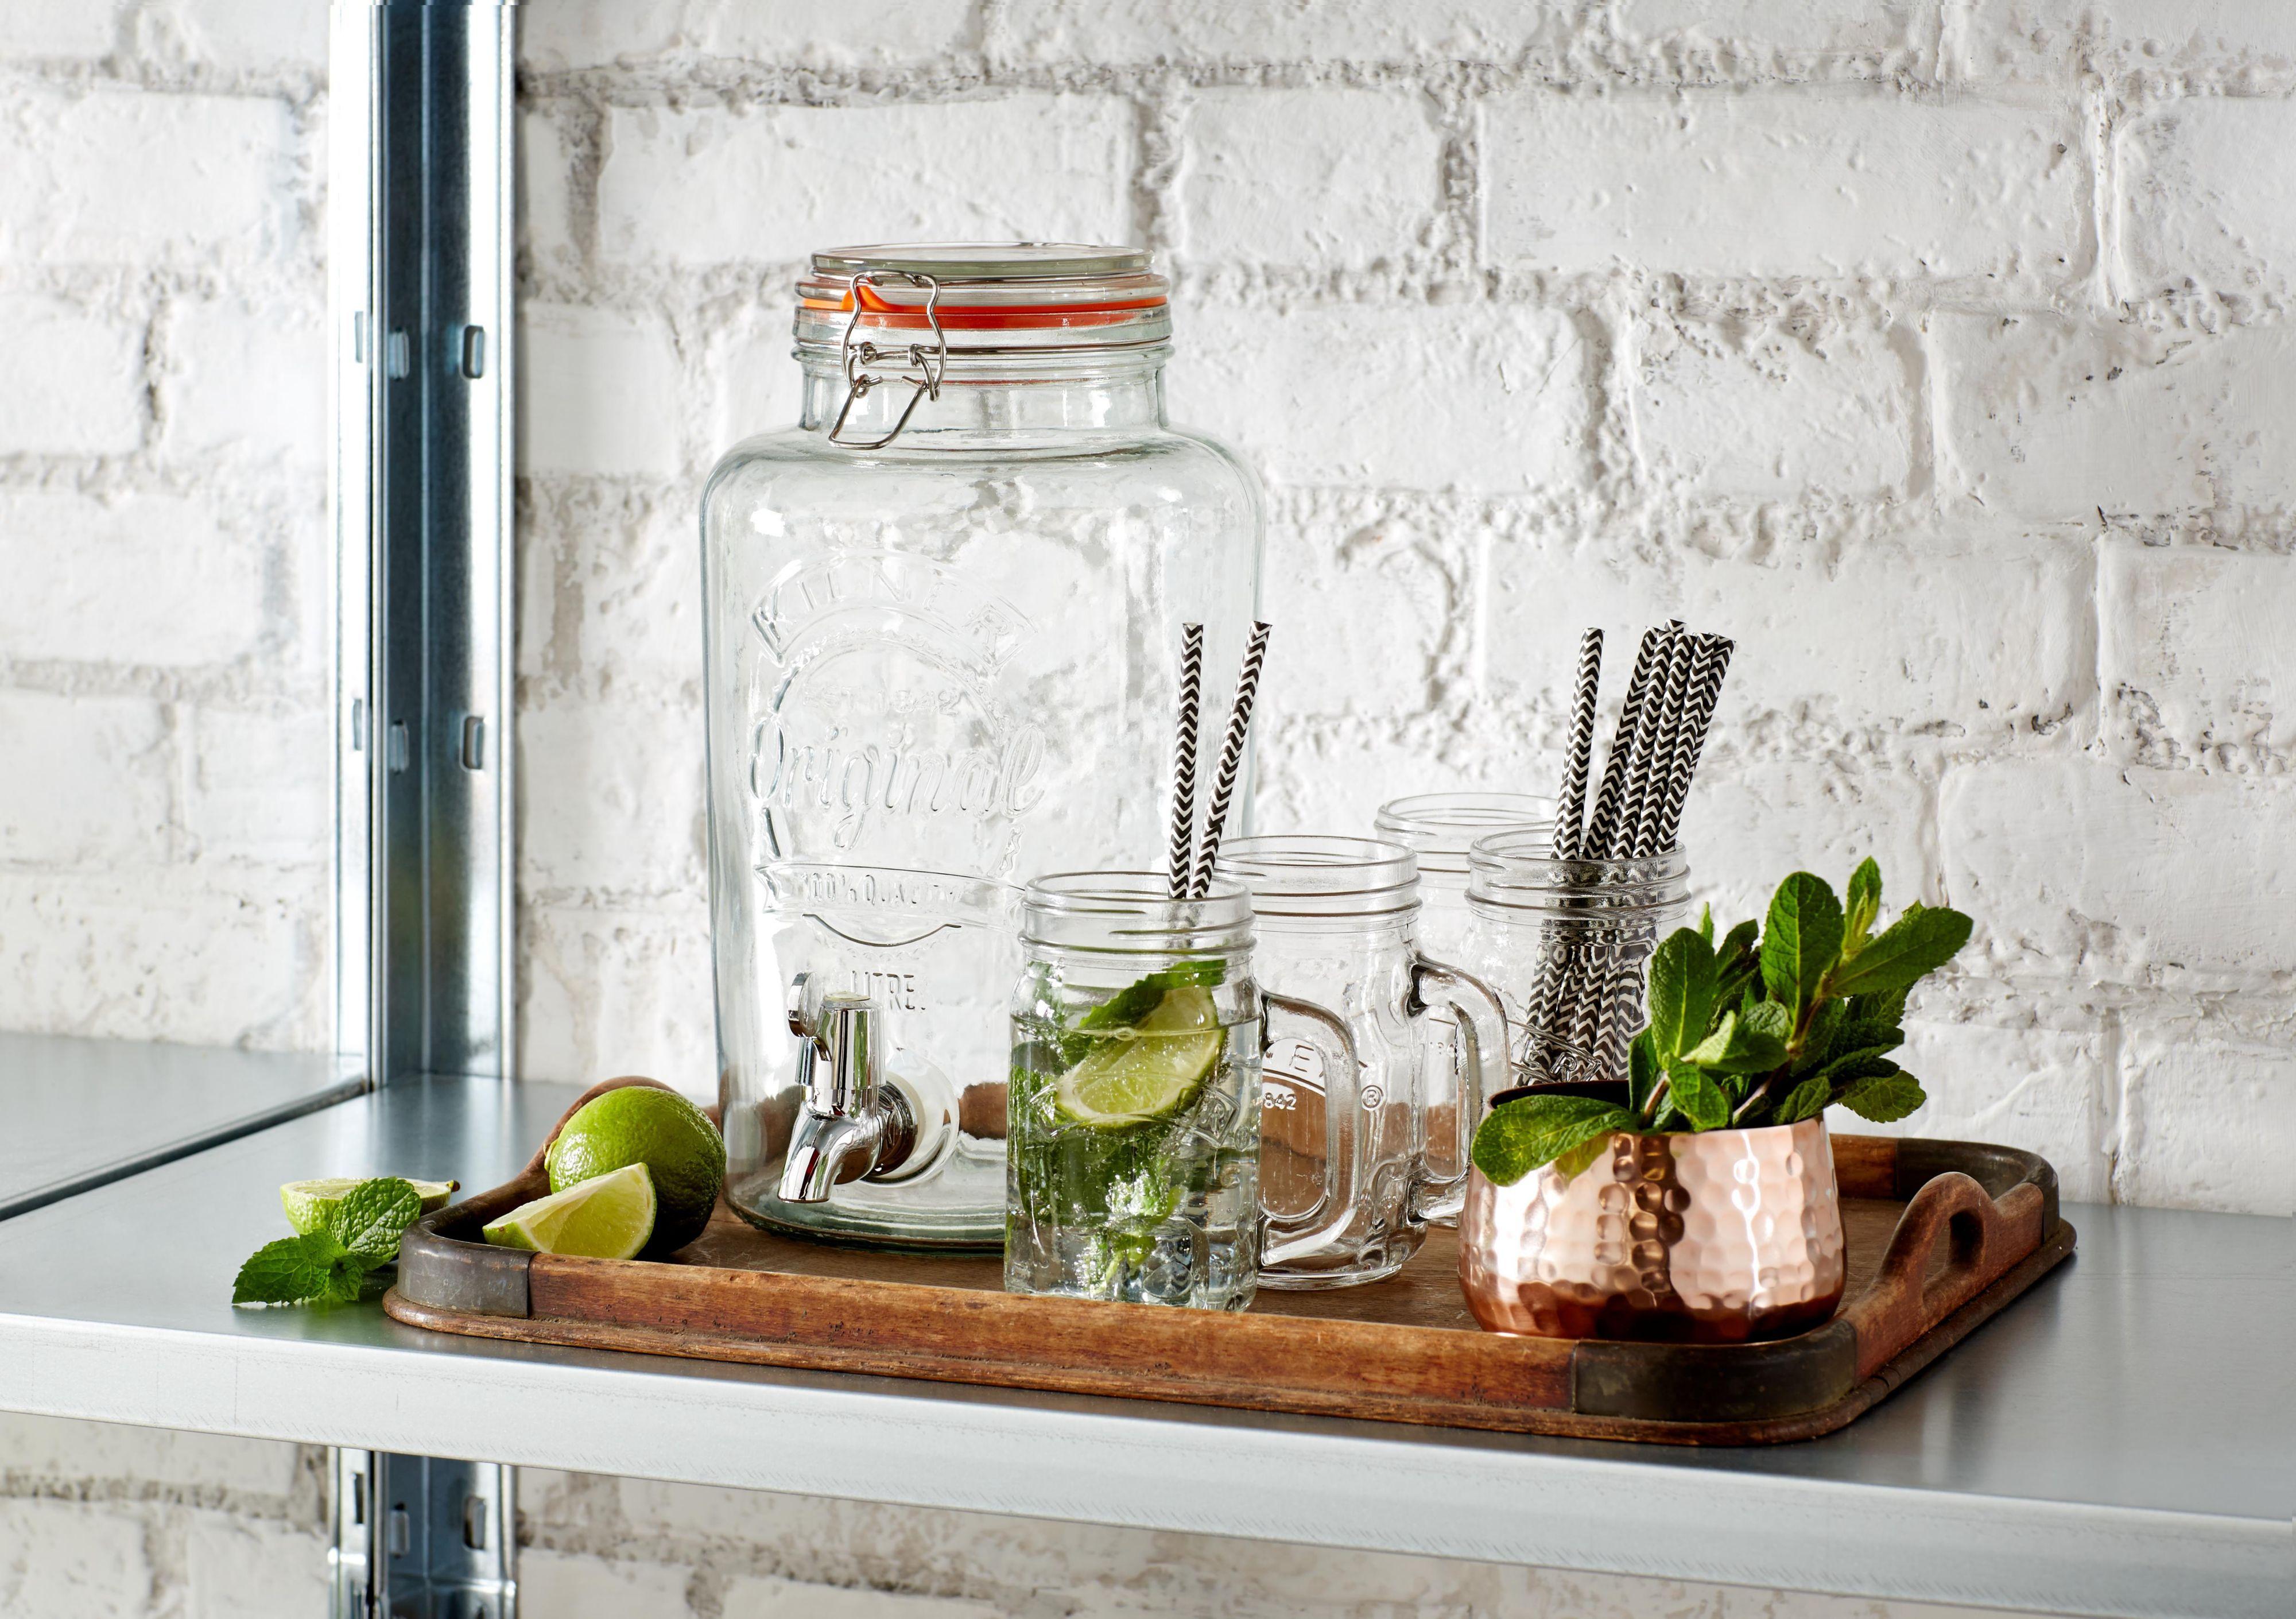 Kitchen Diy kitchen storage, Diy kitchen, Diy crafts